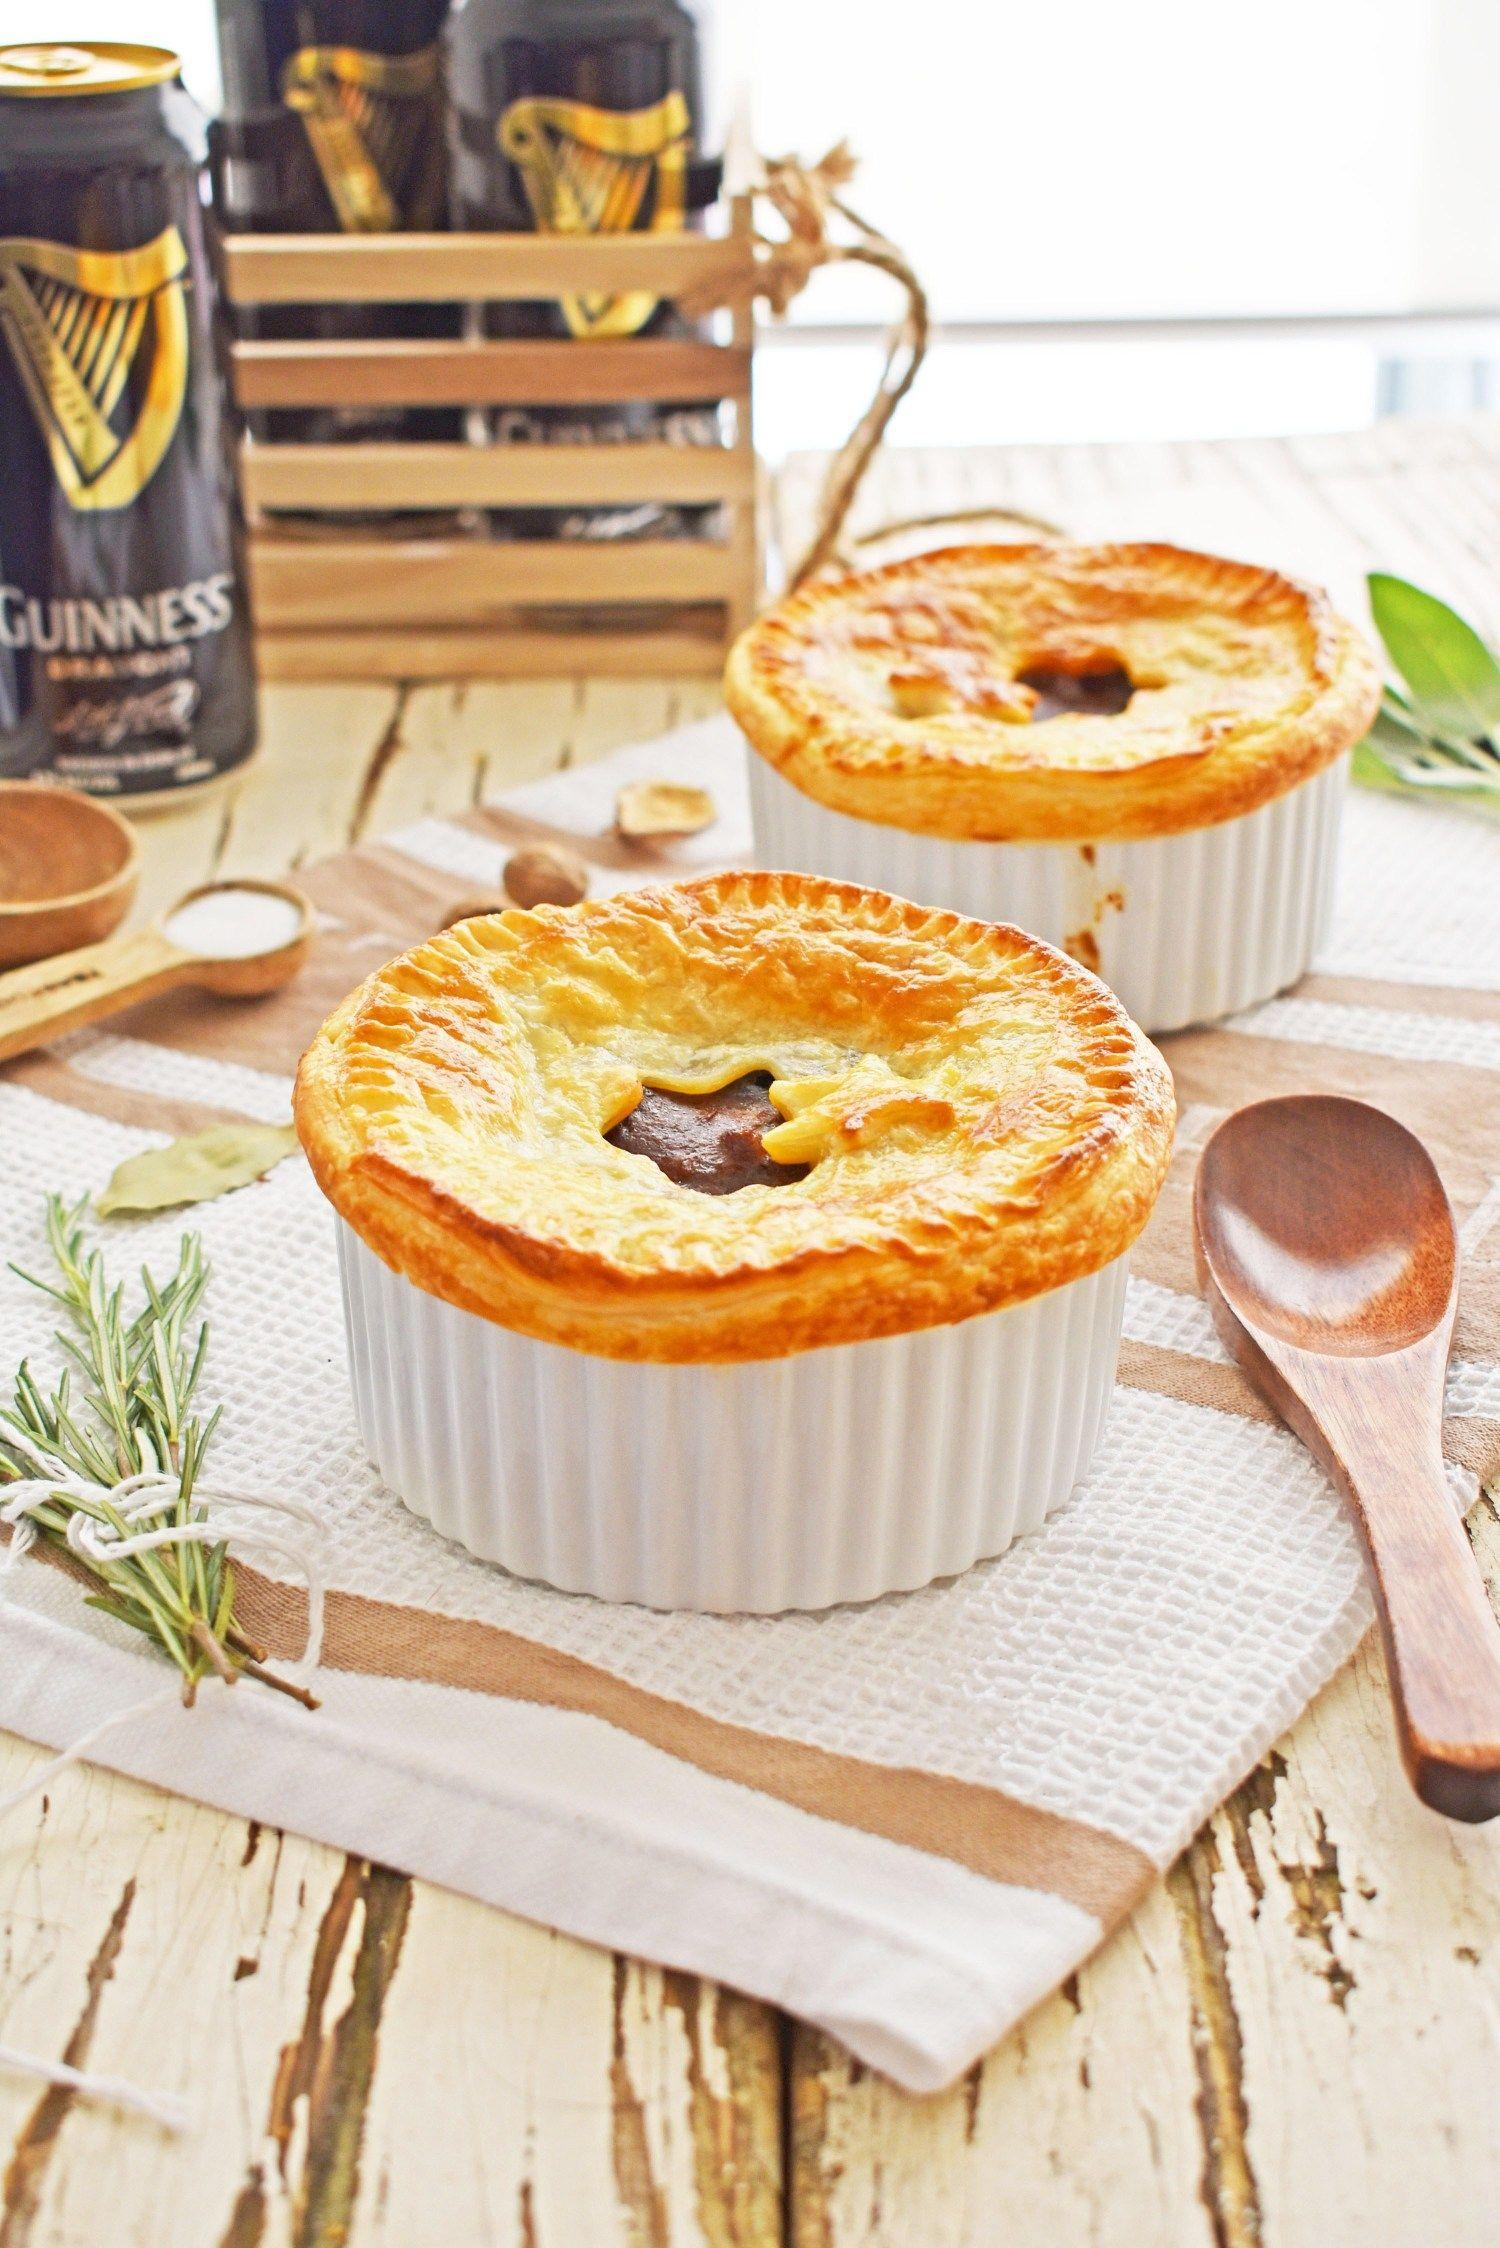 Pressure Cooker Steak and Guinness Pot Pies | Recipe ...